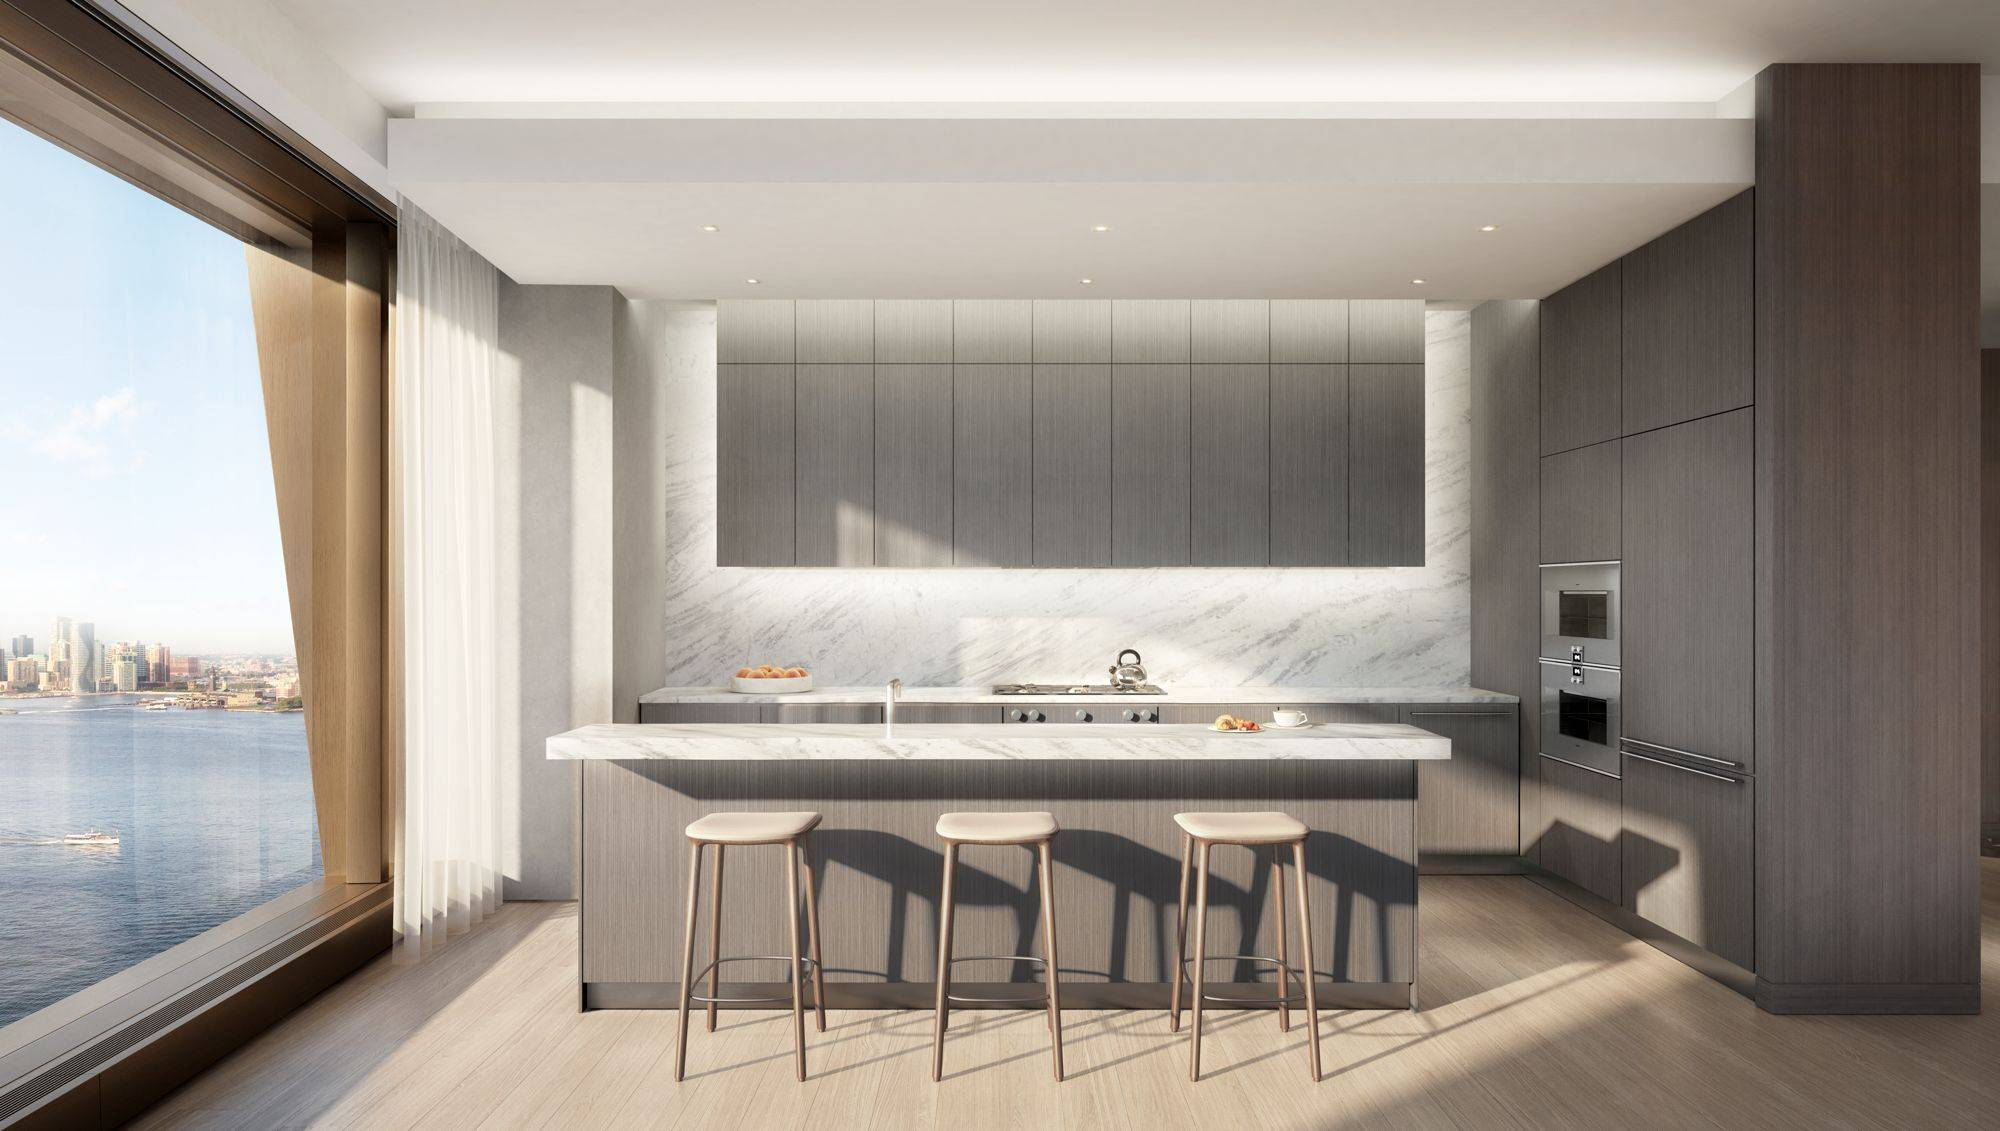 XI_Rend_West_kitchenmorning.jpg